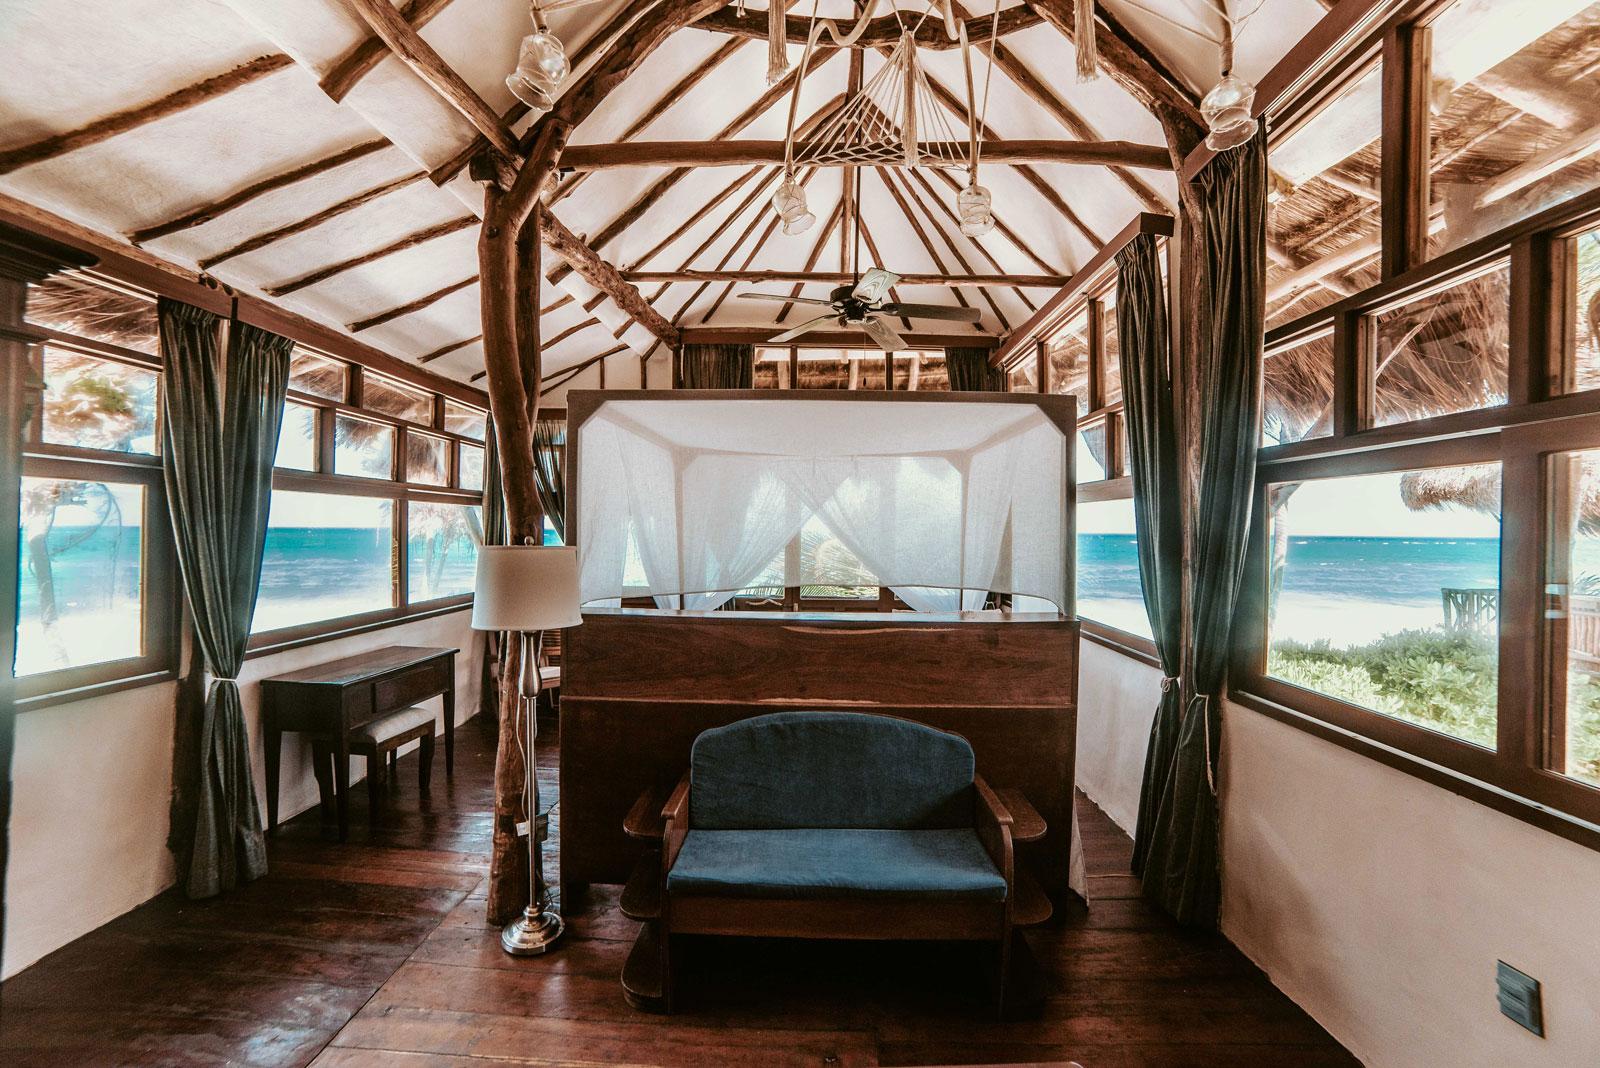 Maya_Luxe_Riviera_Maya_Luxury_Villas_Experiences_Tulum_Hotel_Zone_2_Bedrooms_Casa_Madera_11 (1).jpg